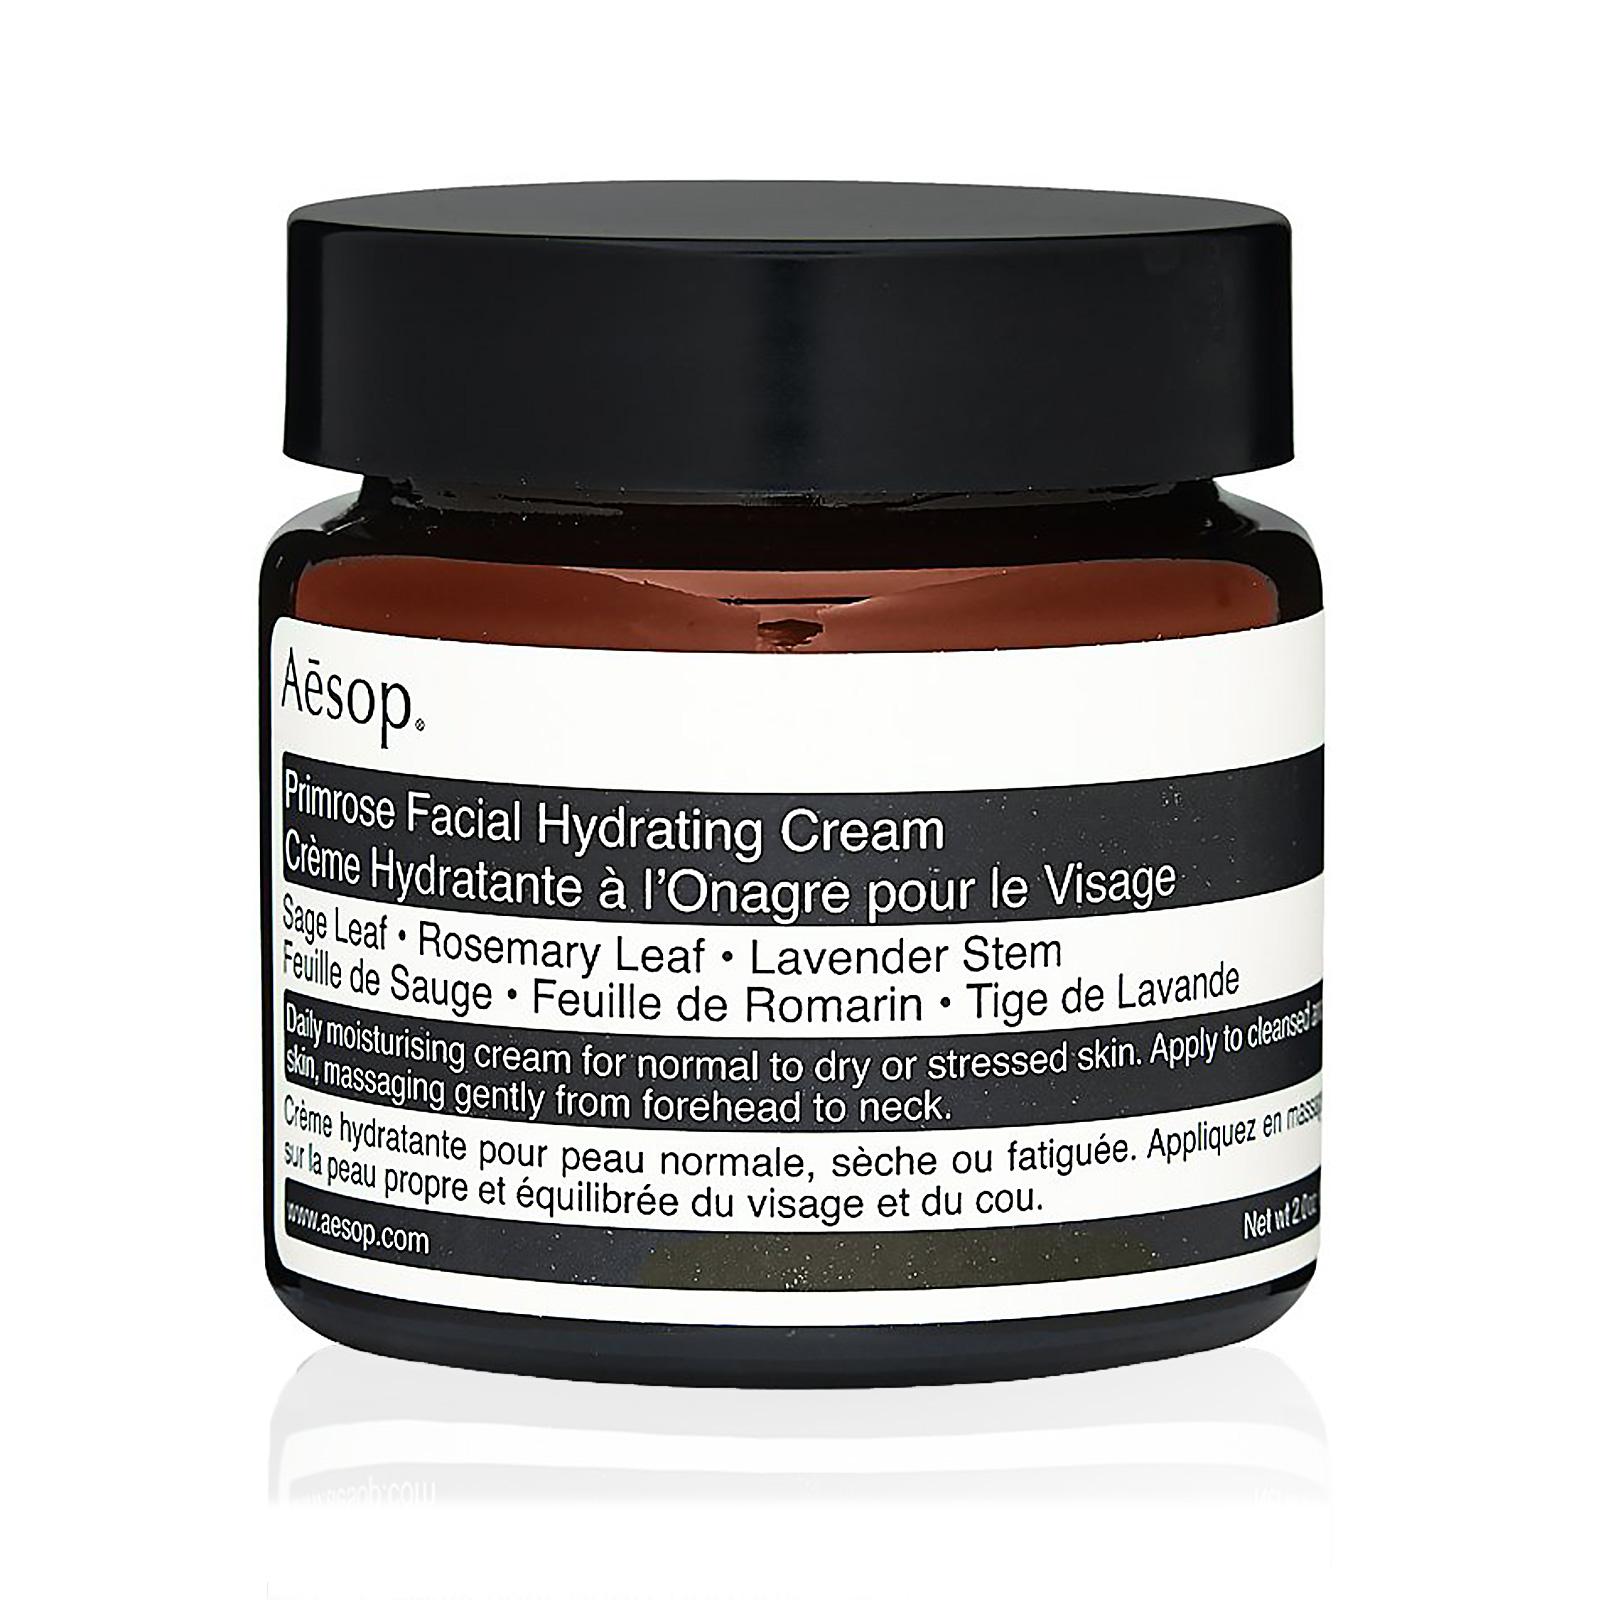 Primrose Facial Hydrating Cream